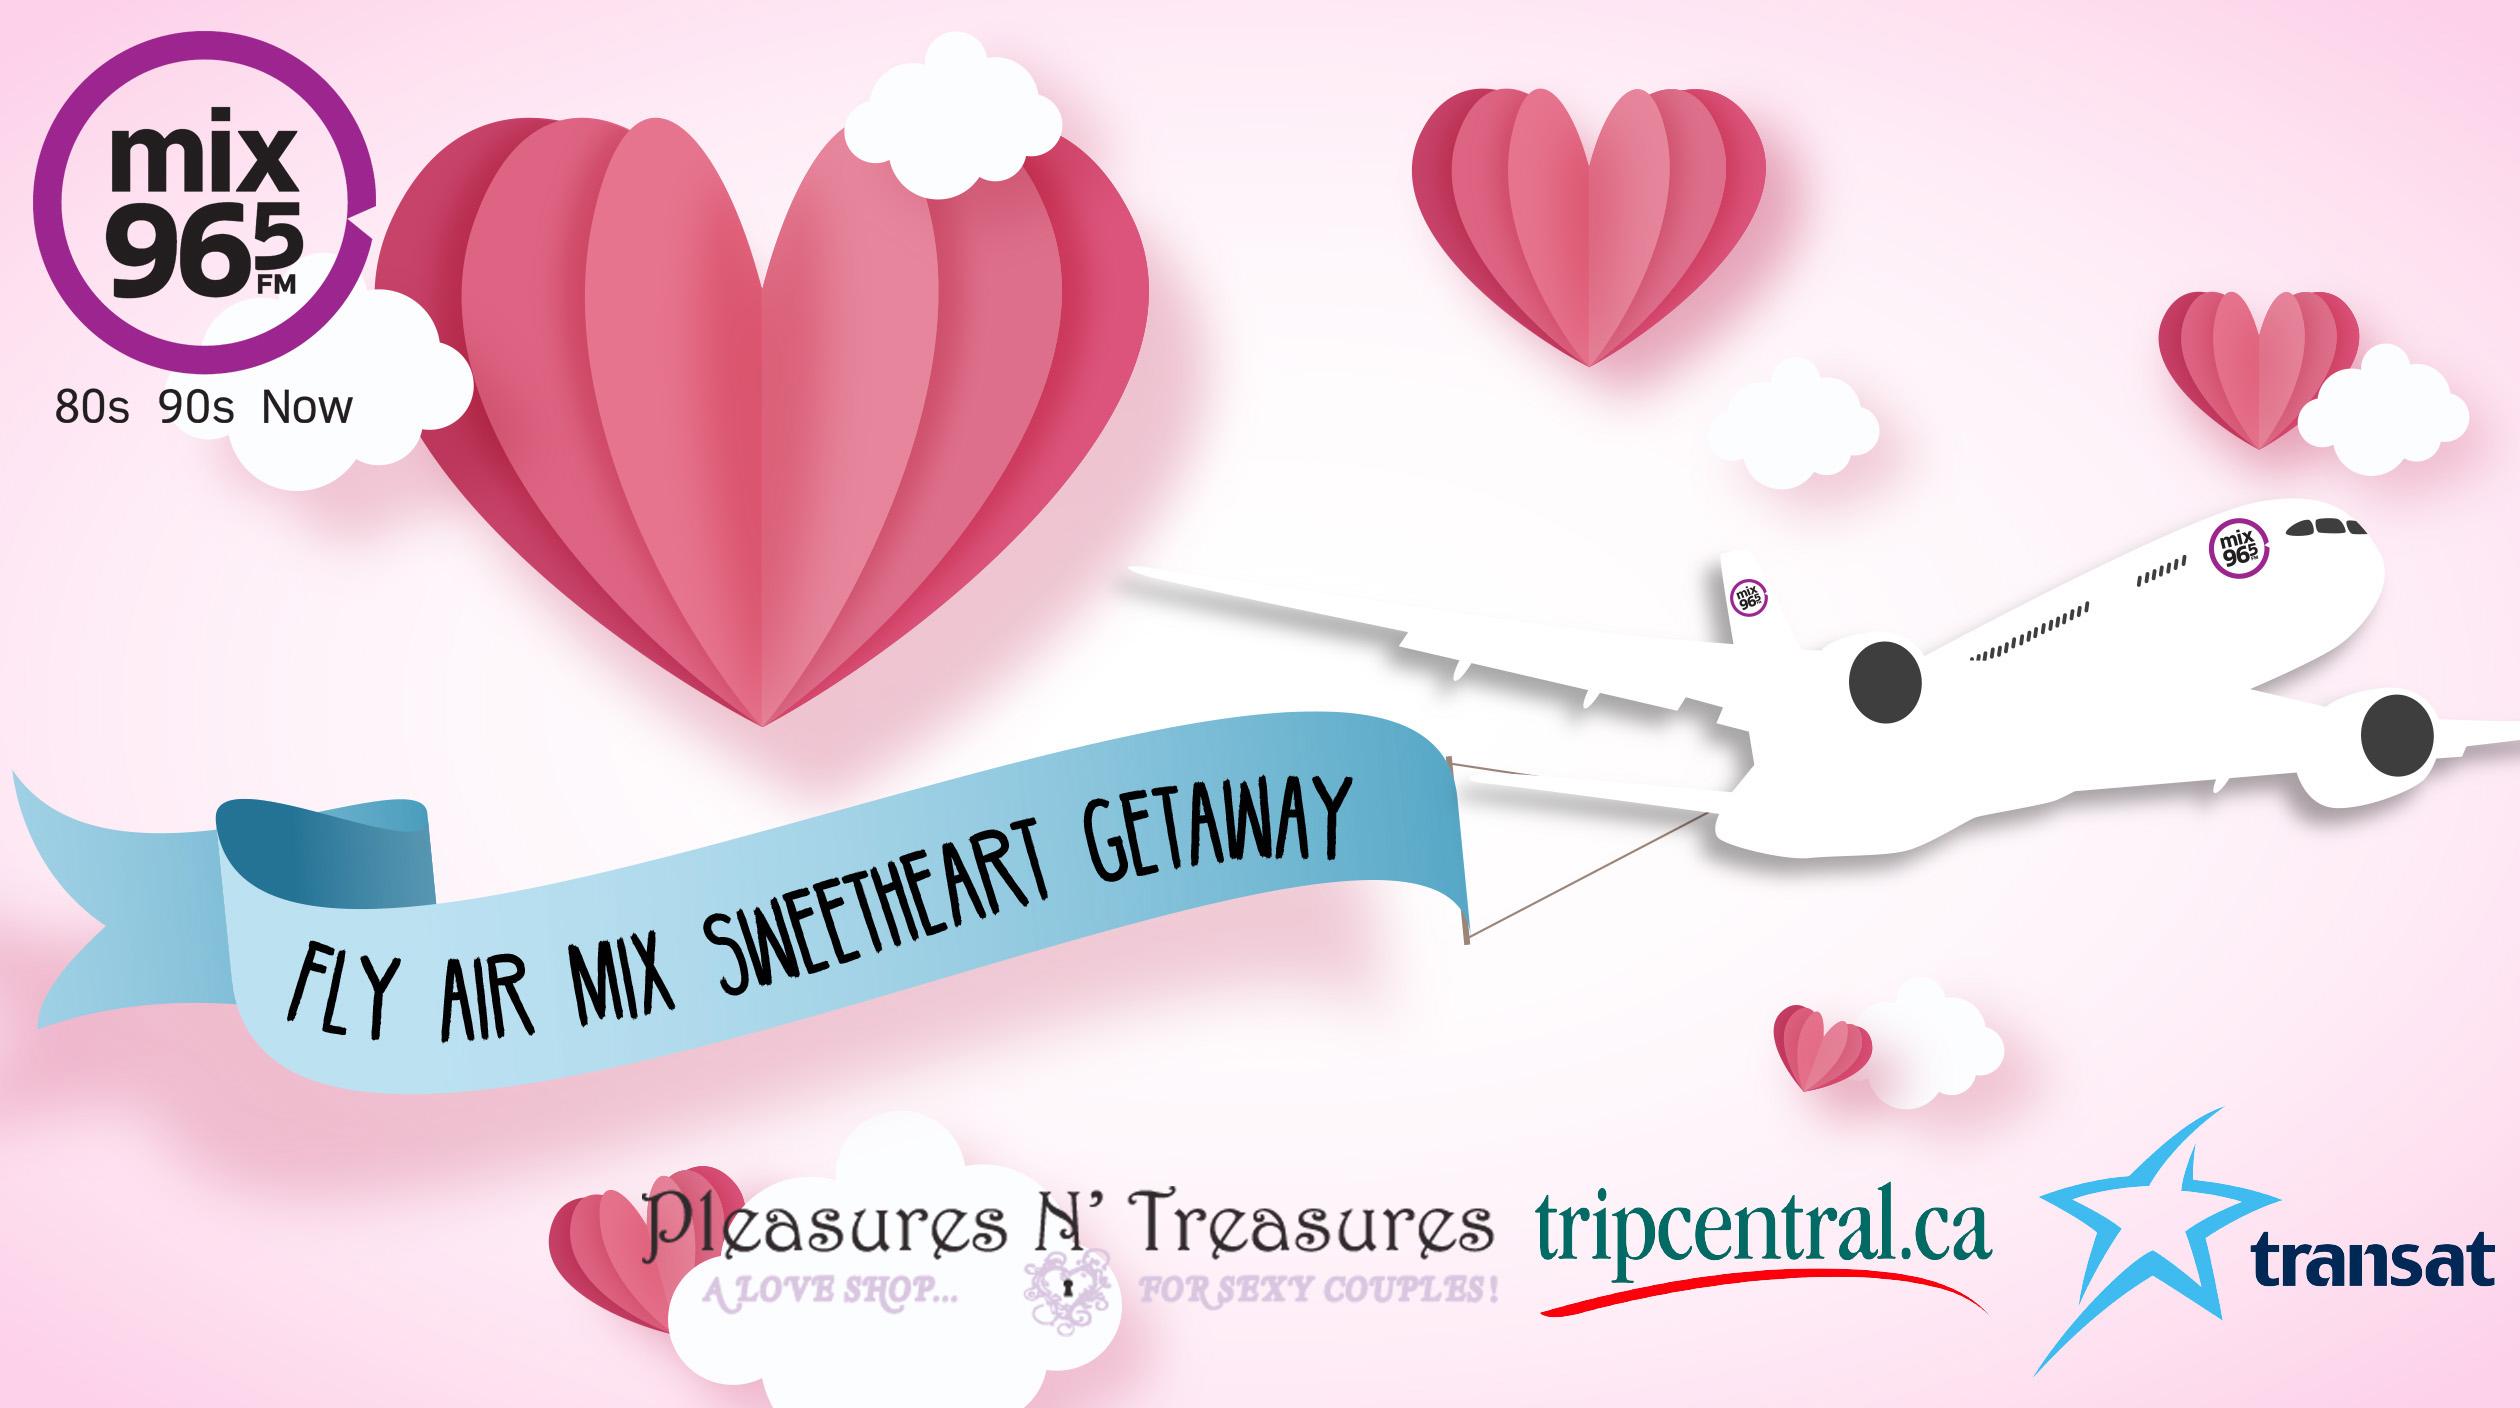 Mix 96-5 Fly Air Mix Sweetheart Getaway